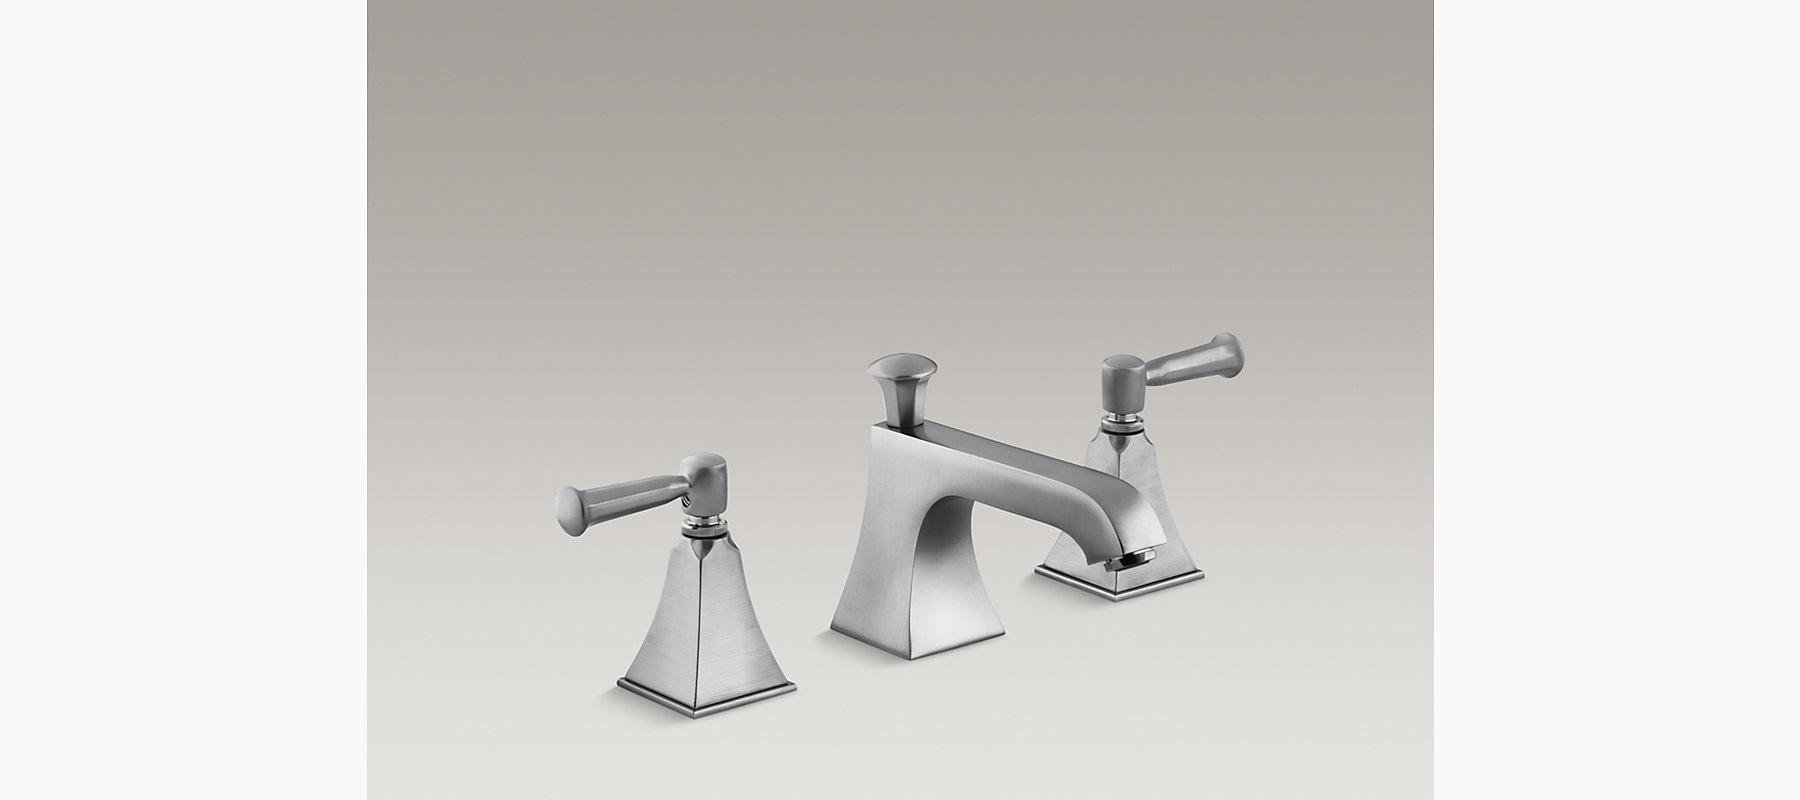 Memoirs Stately Widespread Sink Faucet   K-R454-4S   KOHLER